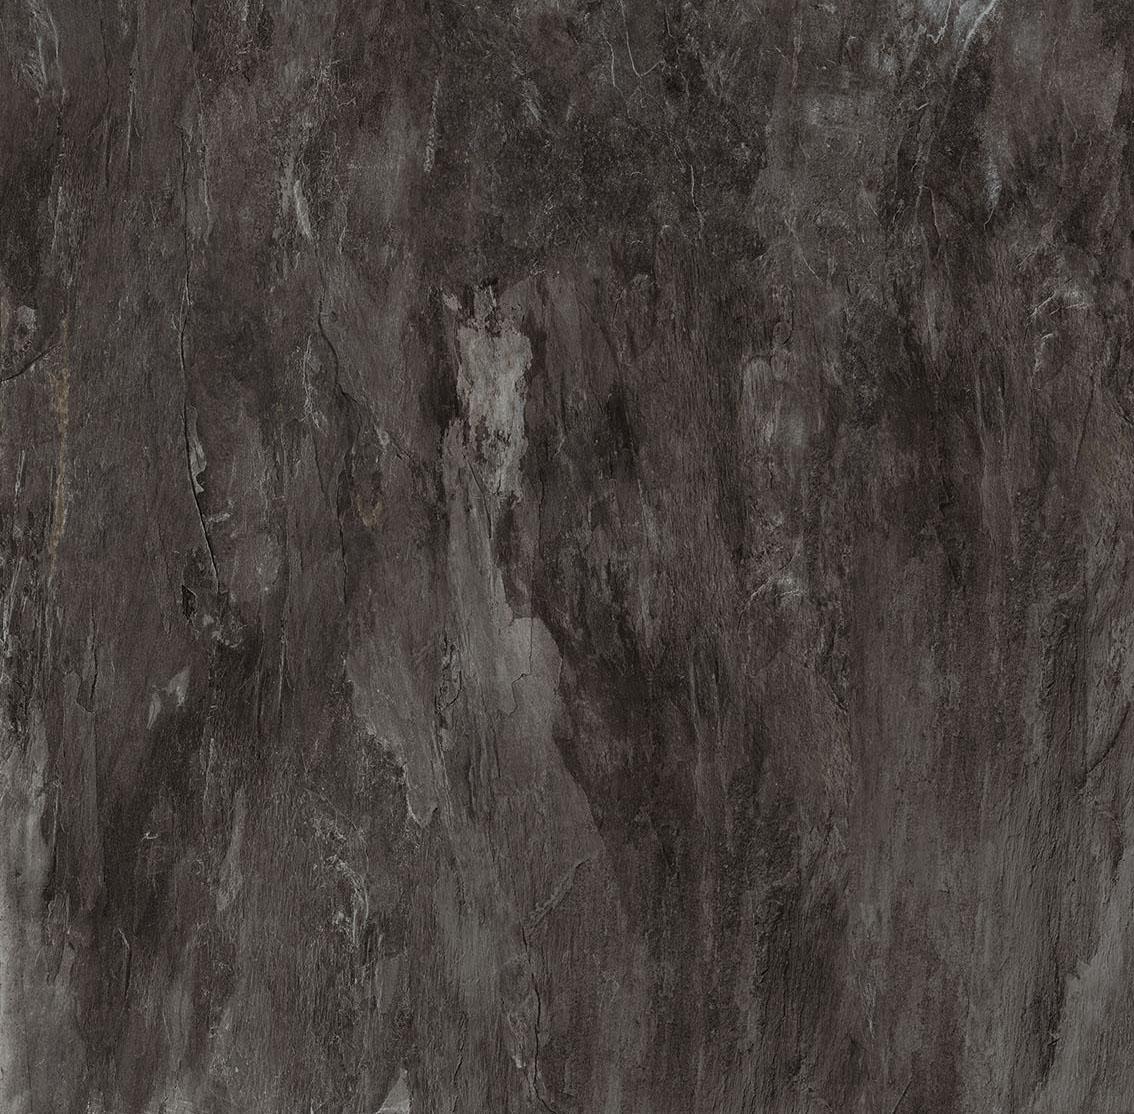 Ardoise Noir Matte 6mm 120 x 120